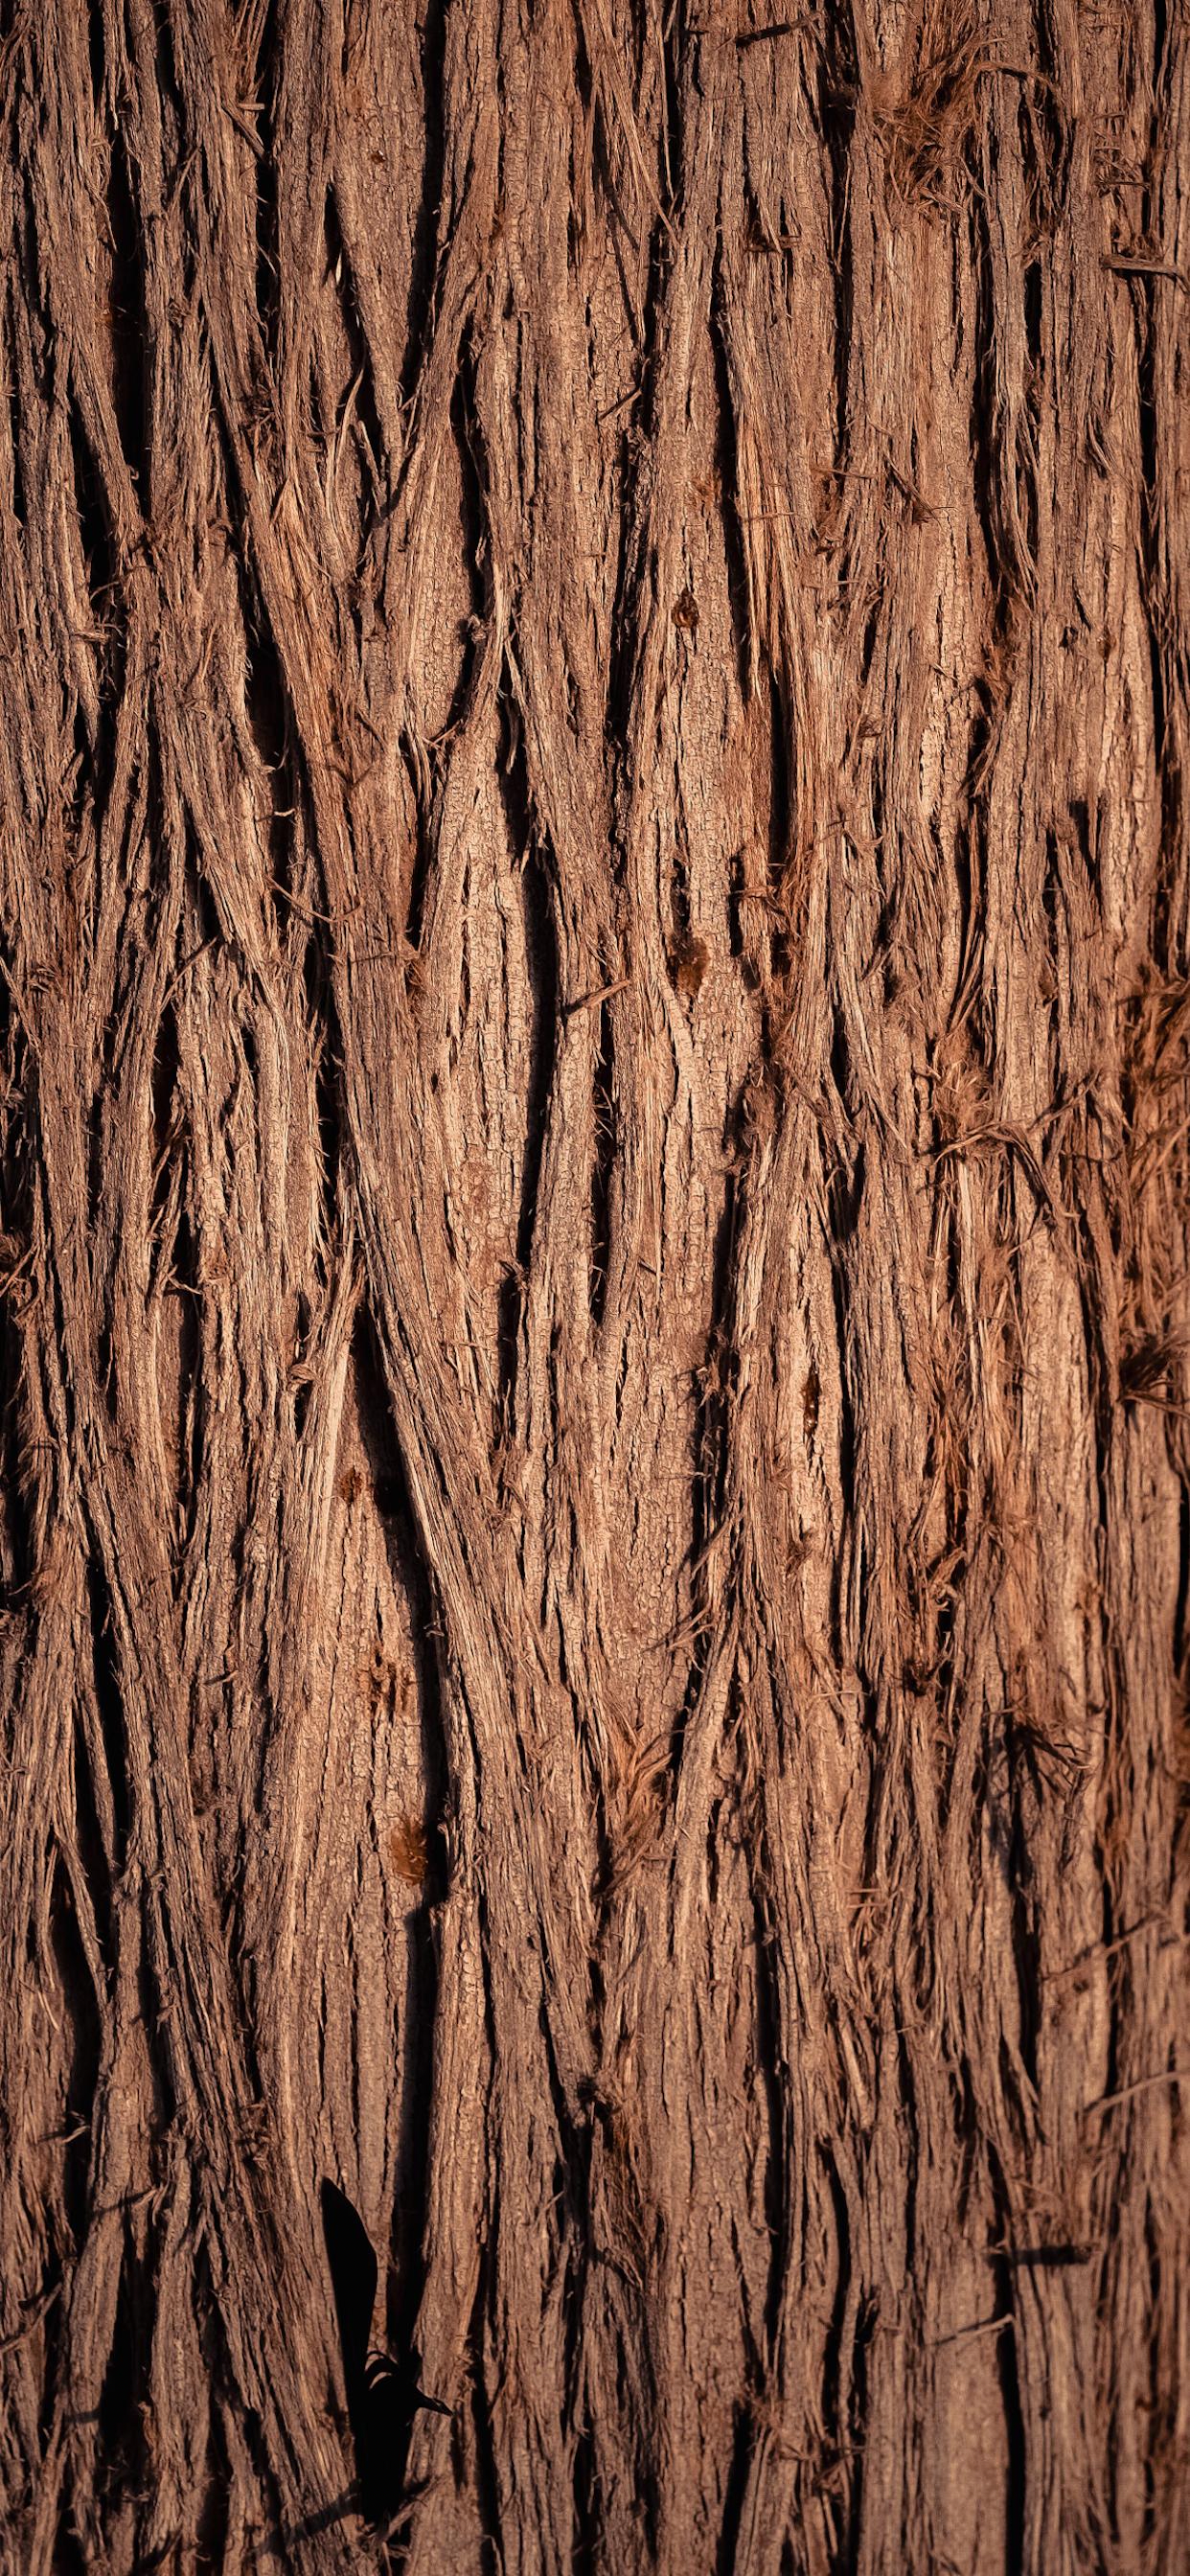 iPhone wallpapers texture wood brown black trunk Fonds d'écran iPhone du 06/03/2020